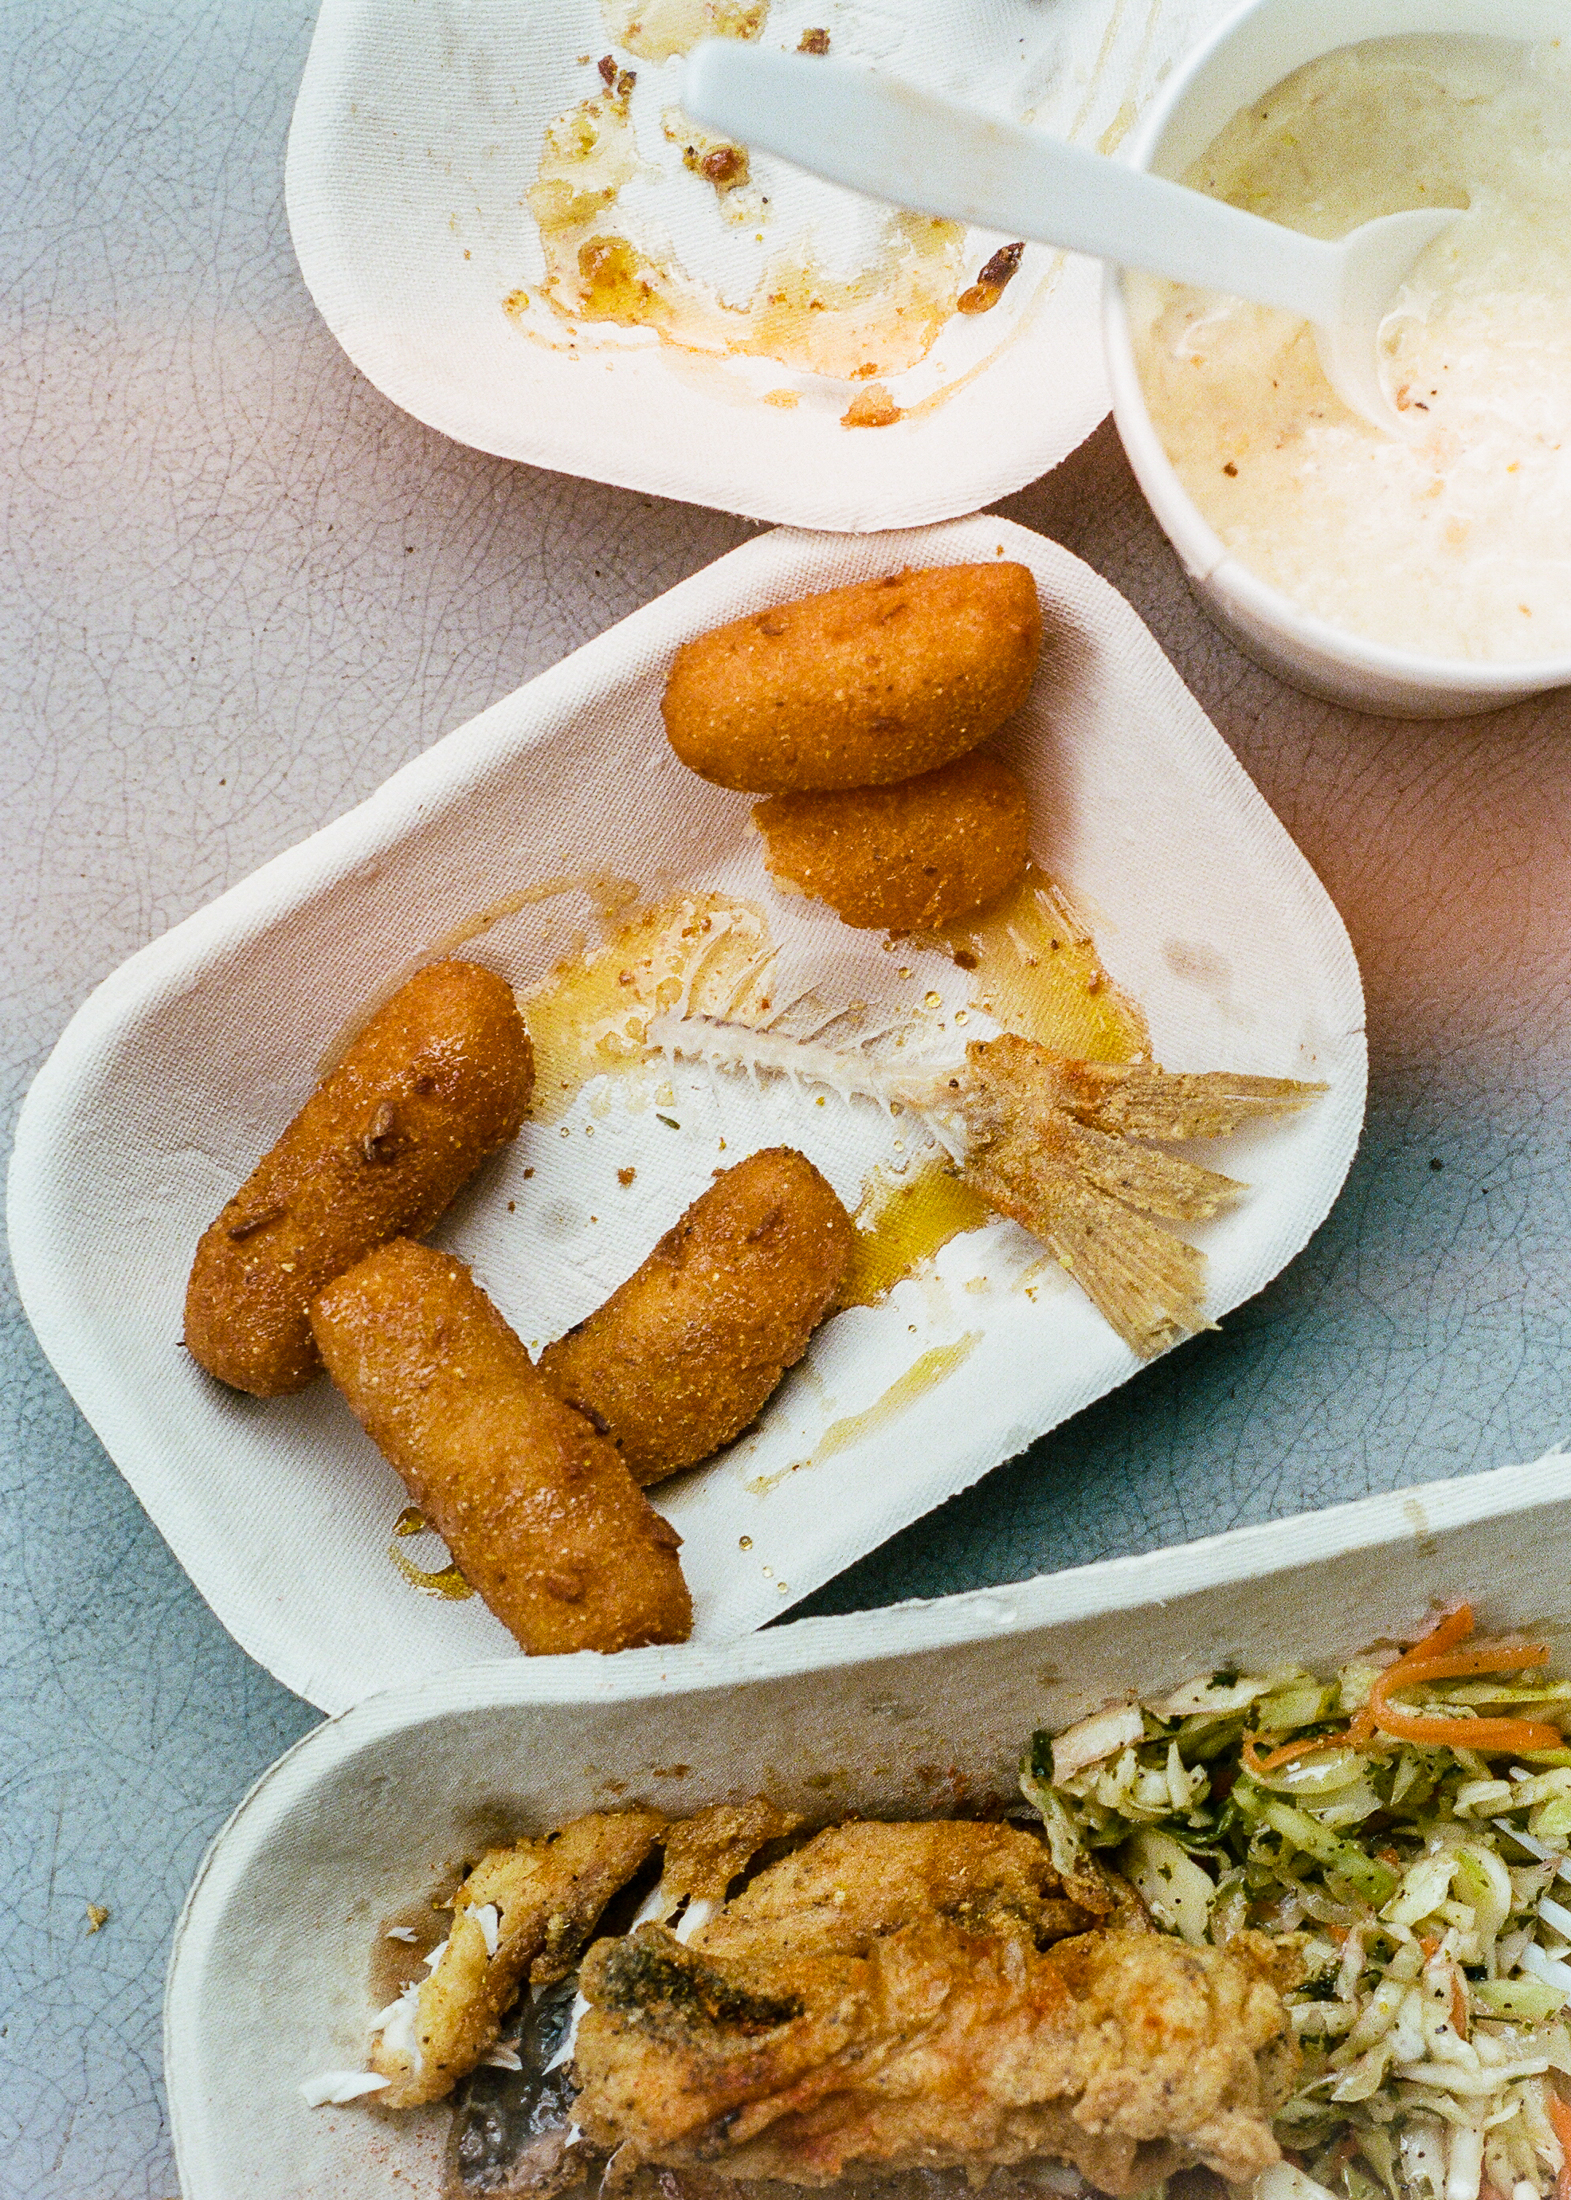 CMR_Food-000063980016.jpg